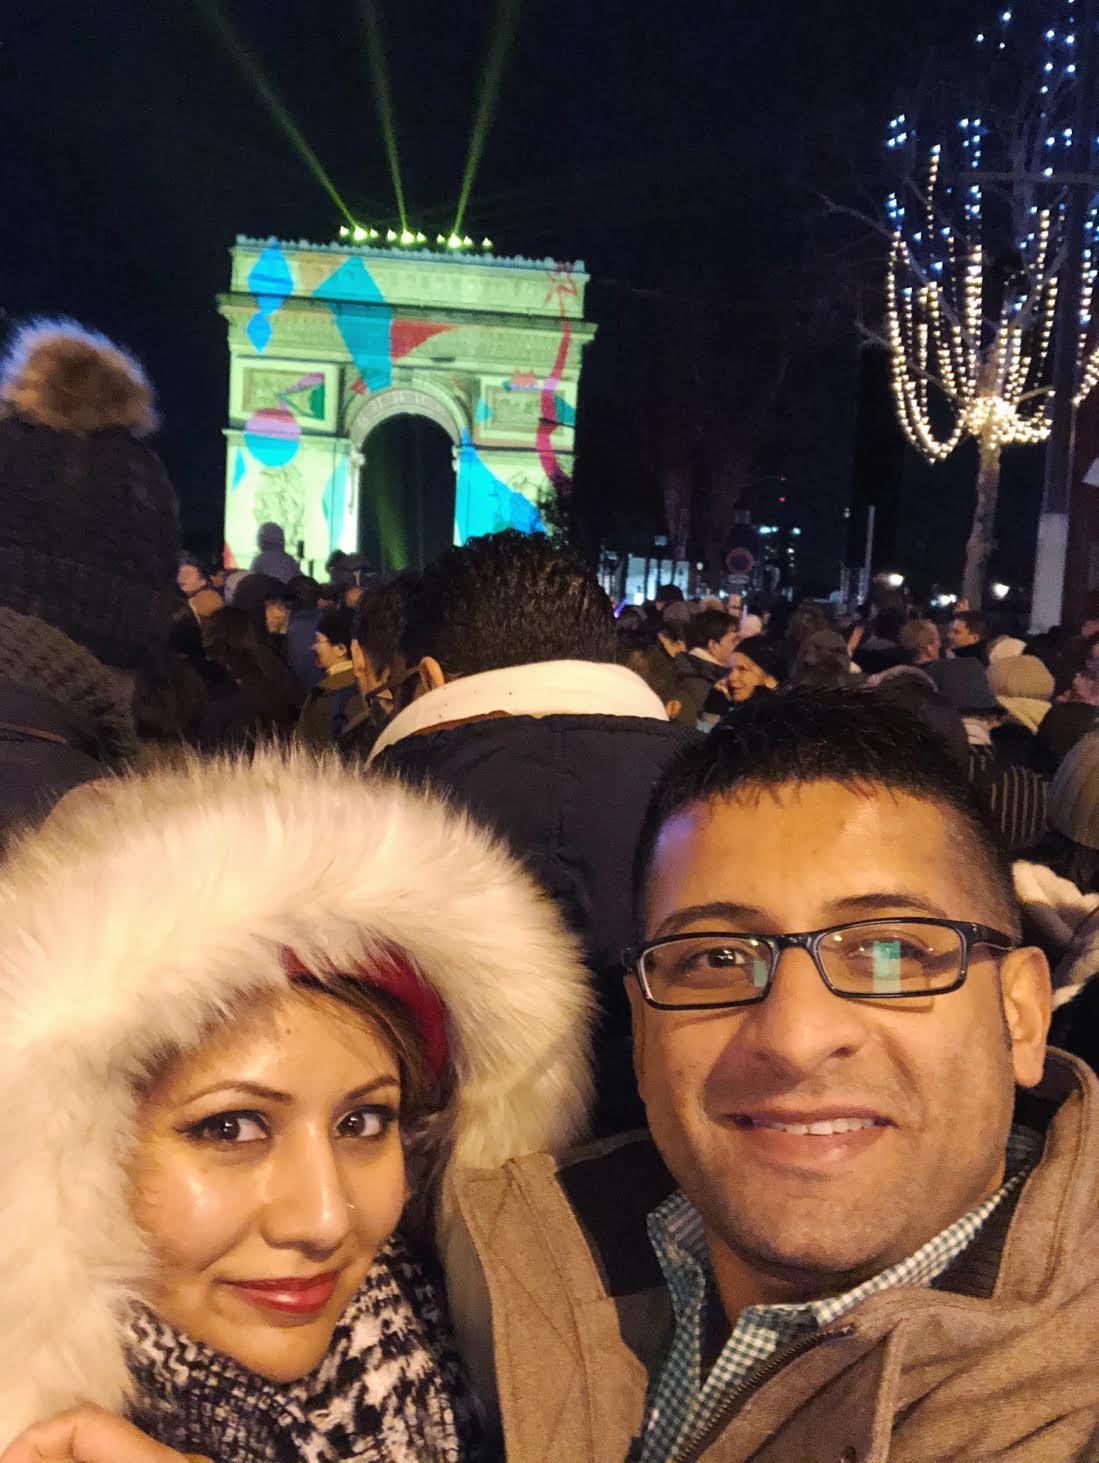 Muslim-travel-tips-Paris-New-Years-Eve-Arc-de-Triomphe.jpg